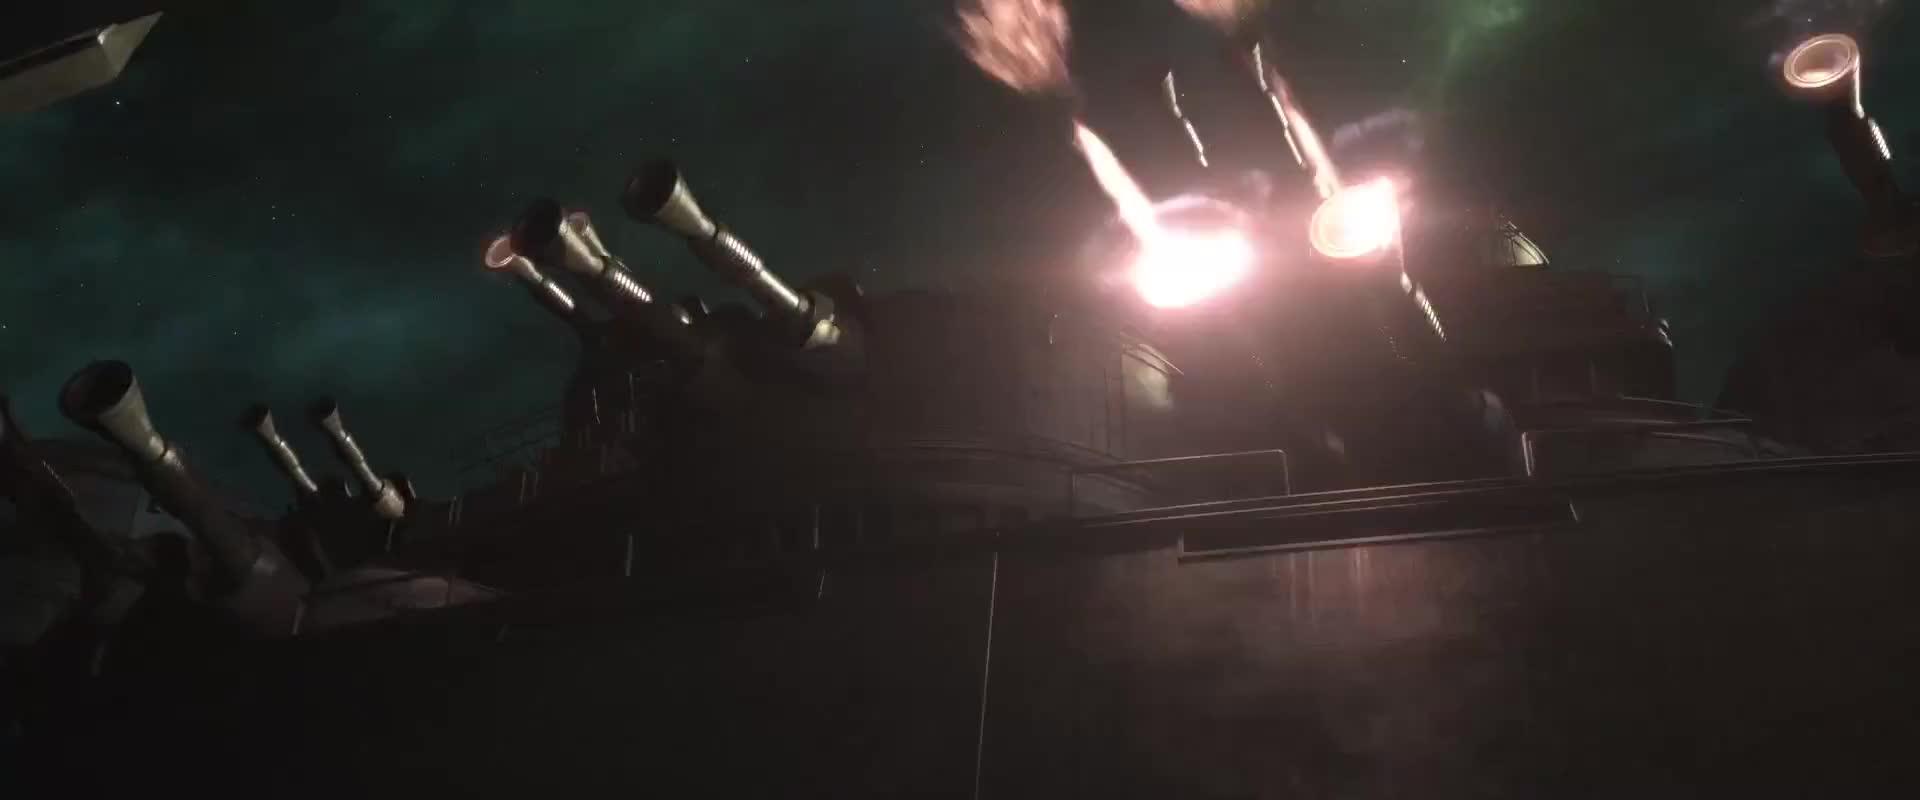 Space Pirate Captain Harlock กัปตันฮาร็อค โจรสลัดอวกาศ (2013)